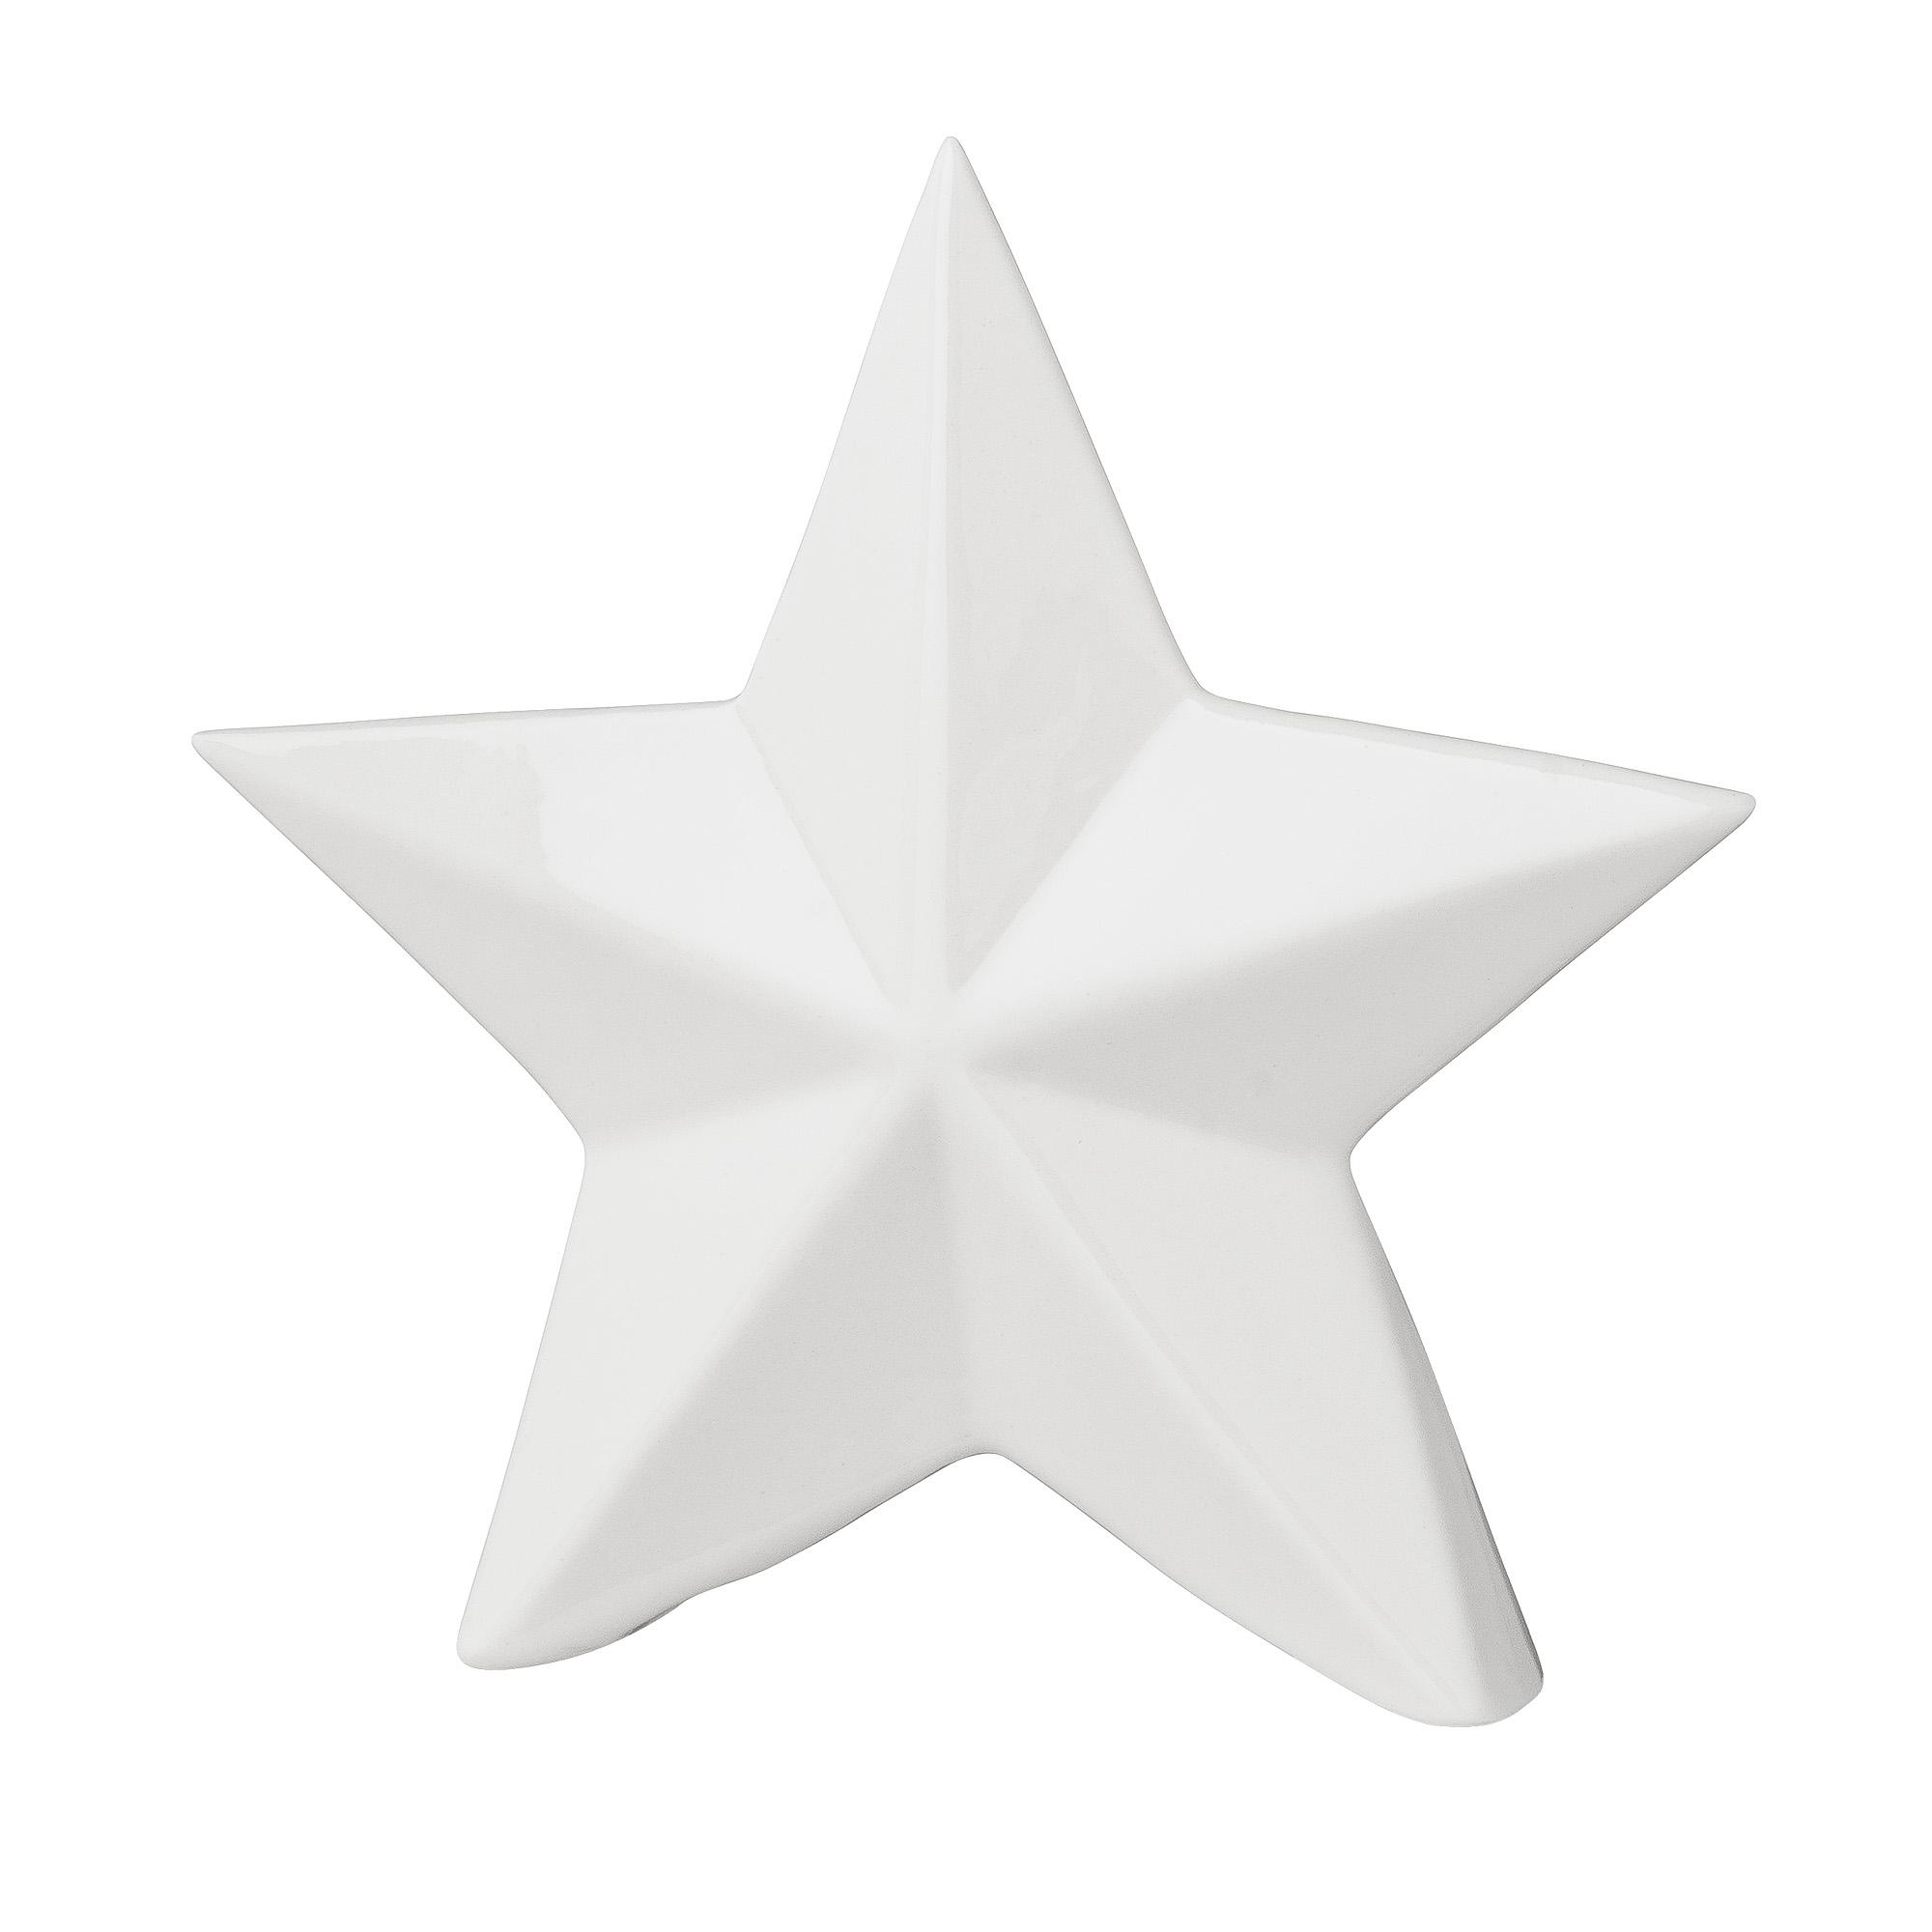 Decoratiune Alistar Alba, Portelan, l14,7xA3,5xH14 cm somproduct.ro